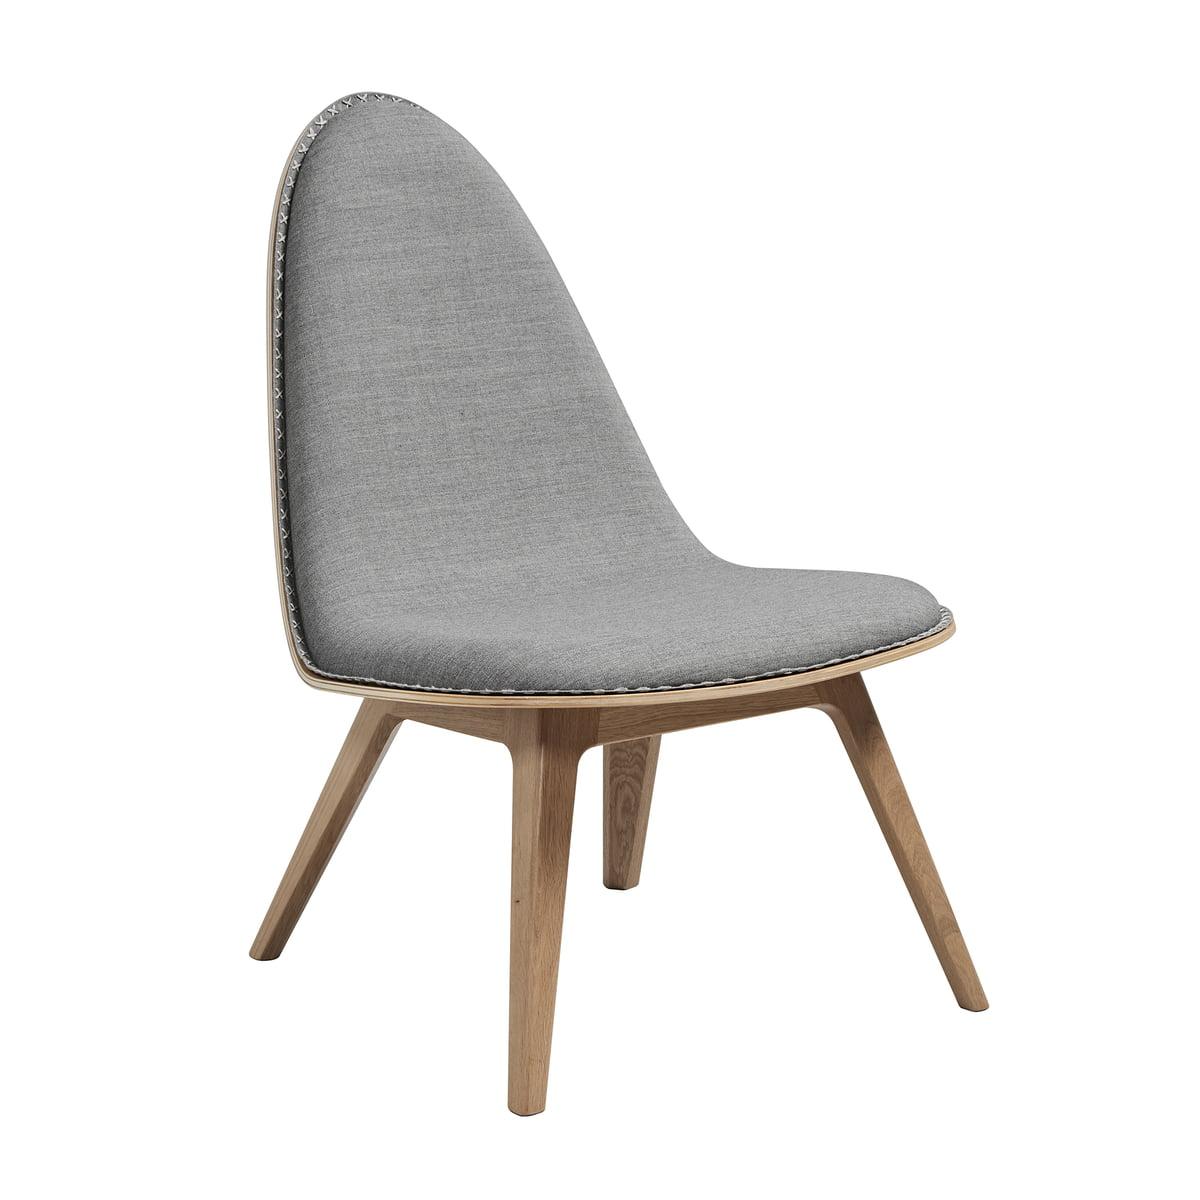 Nordic Lounge Chair Von Sack It Connox Shop